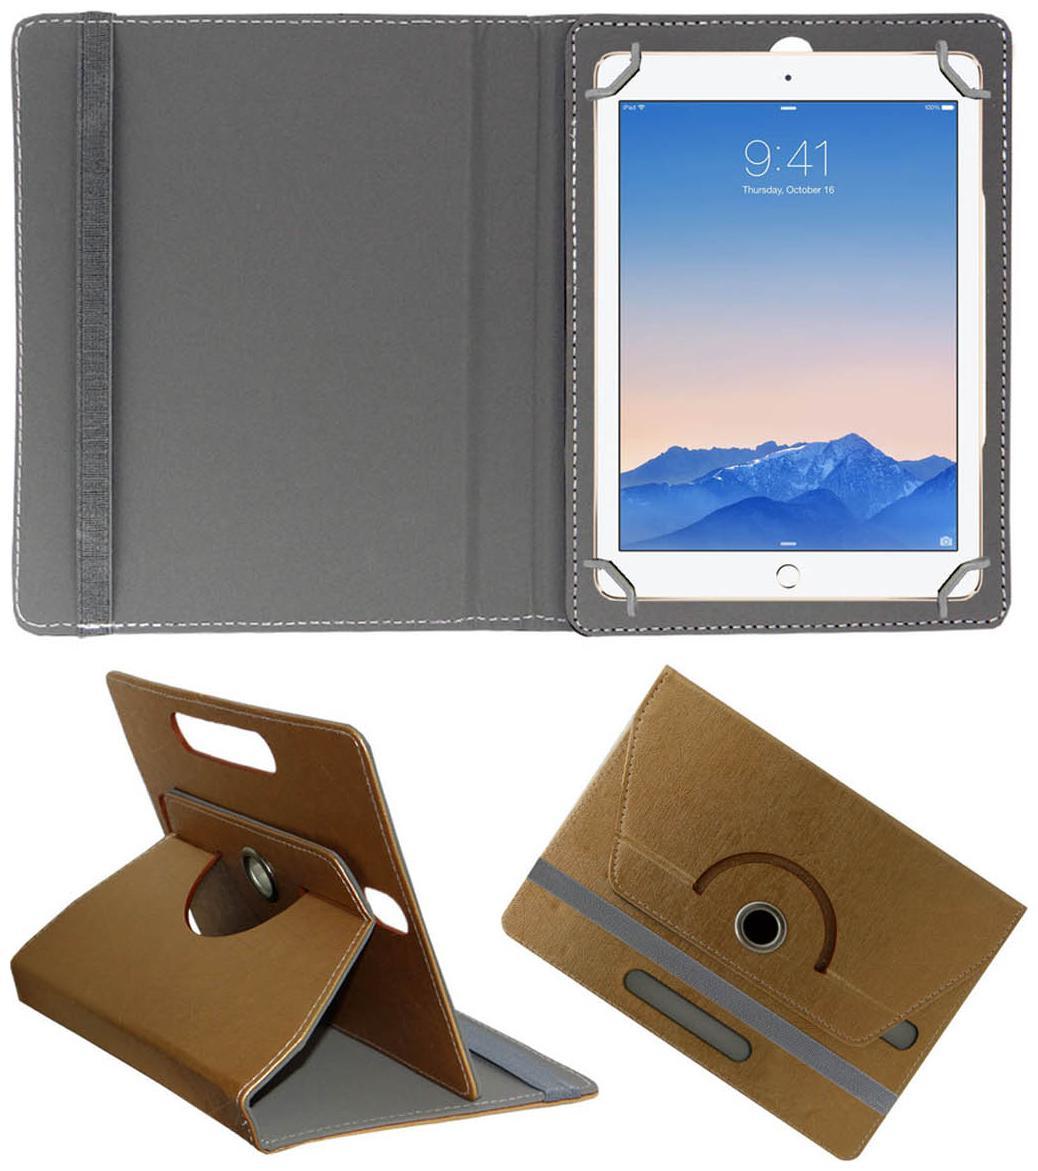 Acm Designer Rotating 360 Flip Cover For Apple Ipad Air 2